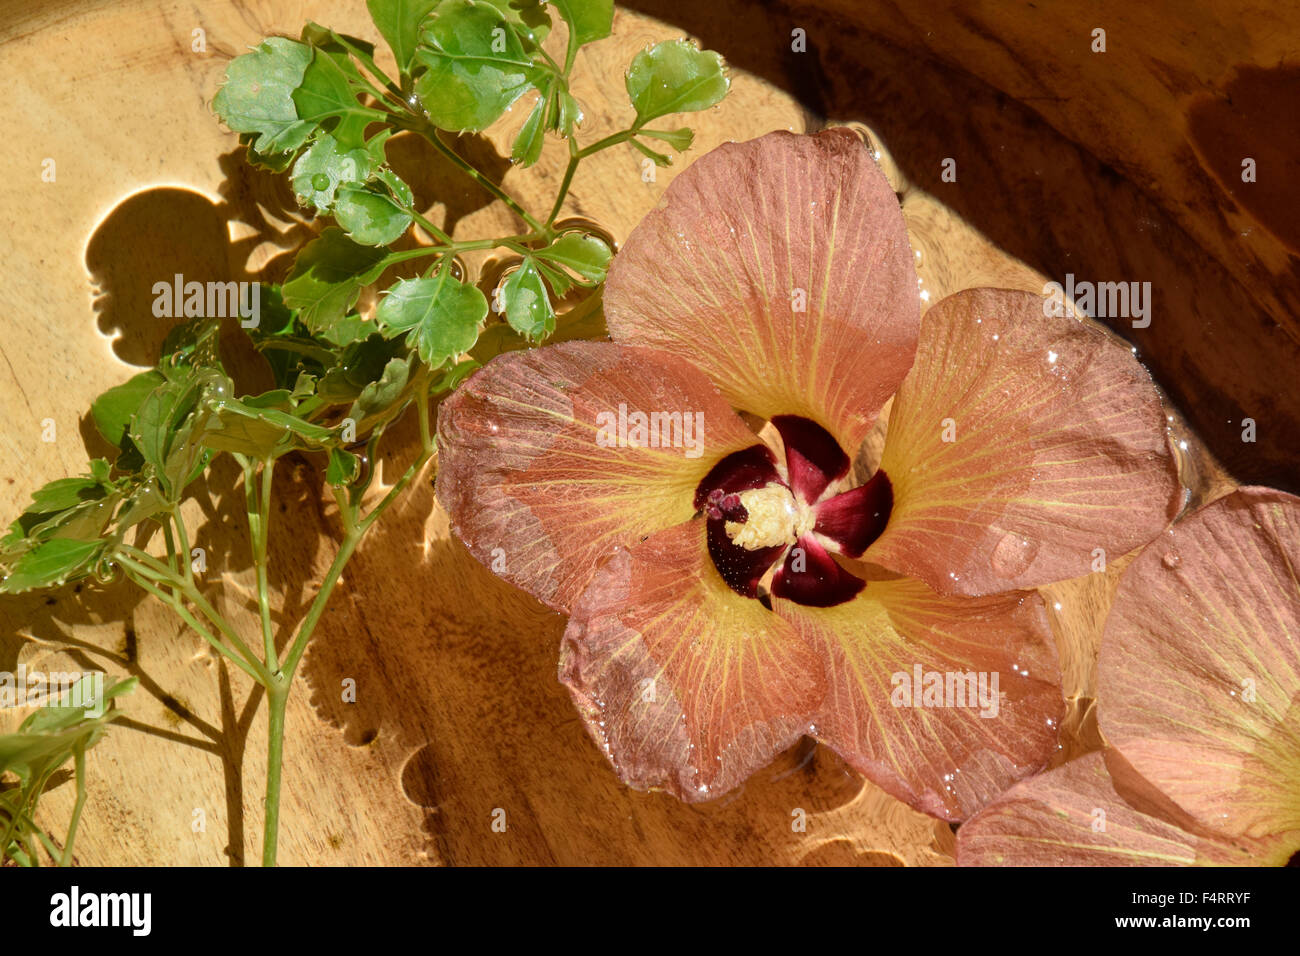 Amiranten, flowers, Deko, decoration, Desroches Island, Seychelles, Africa, pot, water - Stock Image